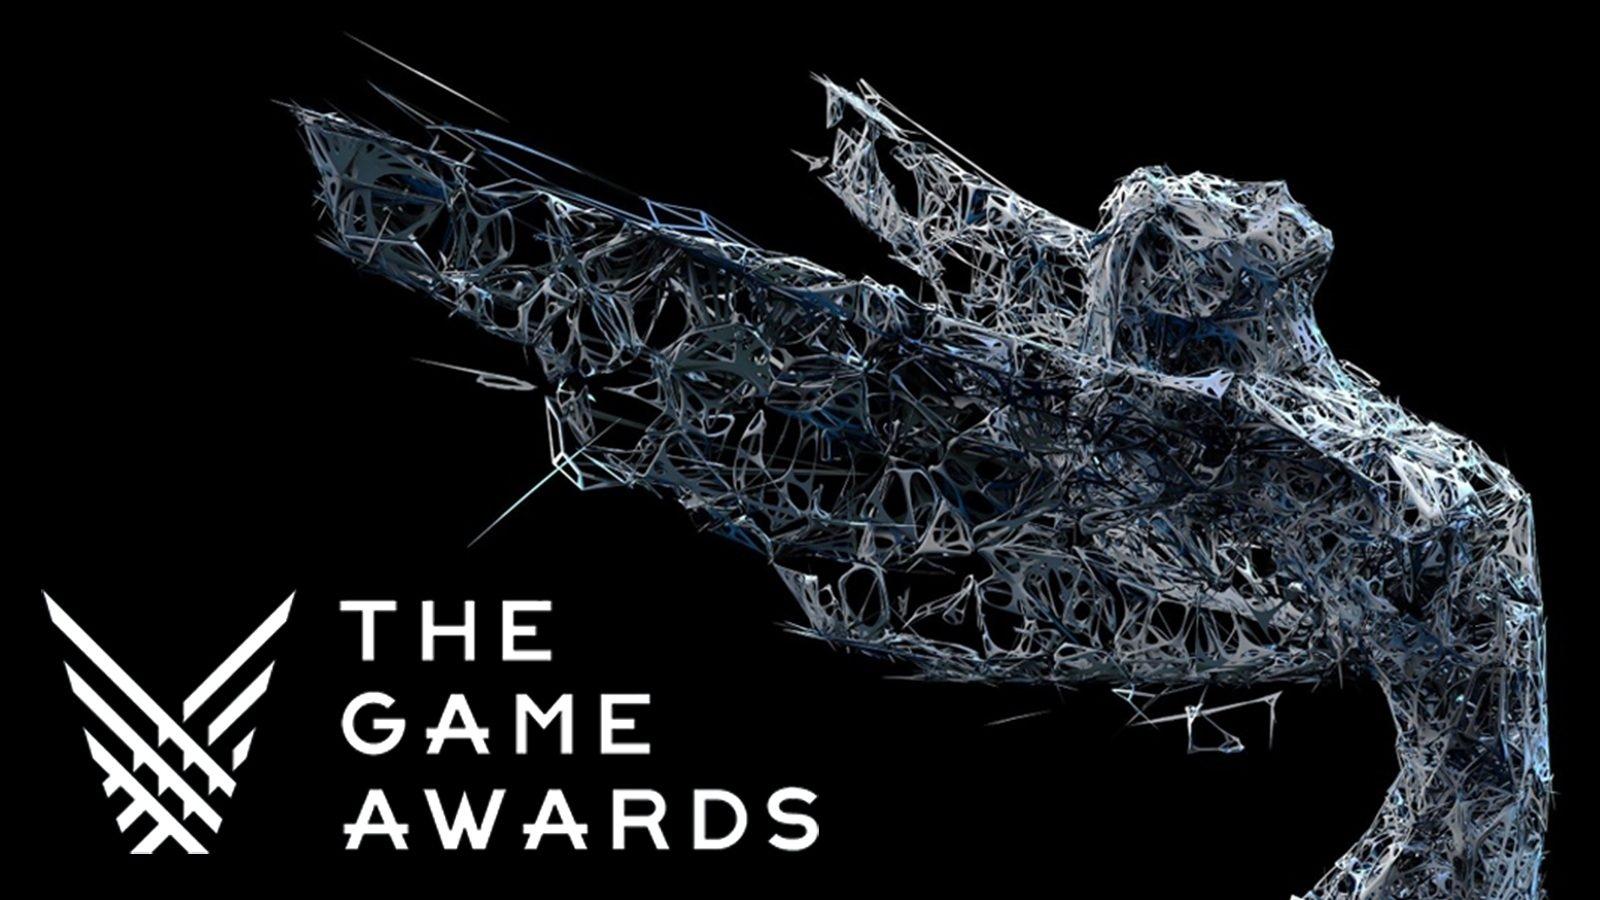 Итоги наград The Game Awards 2018: • Лучшая саундтрек — Red